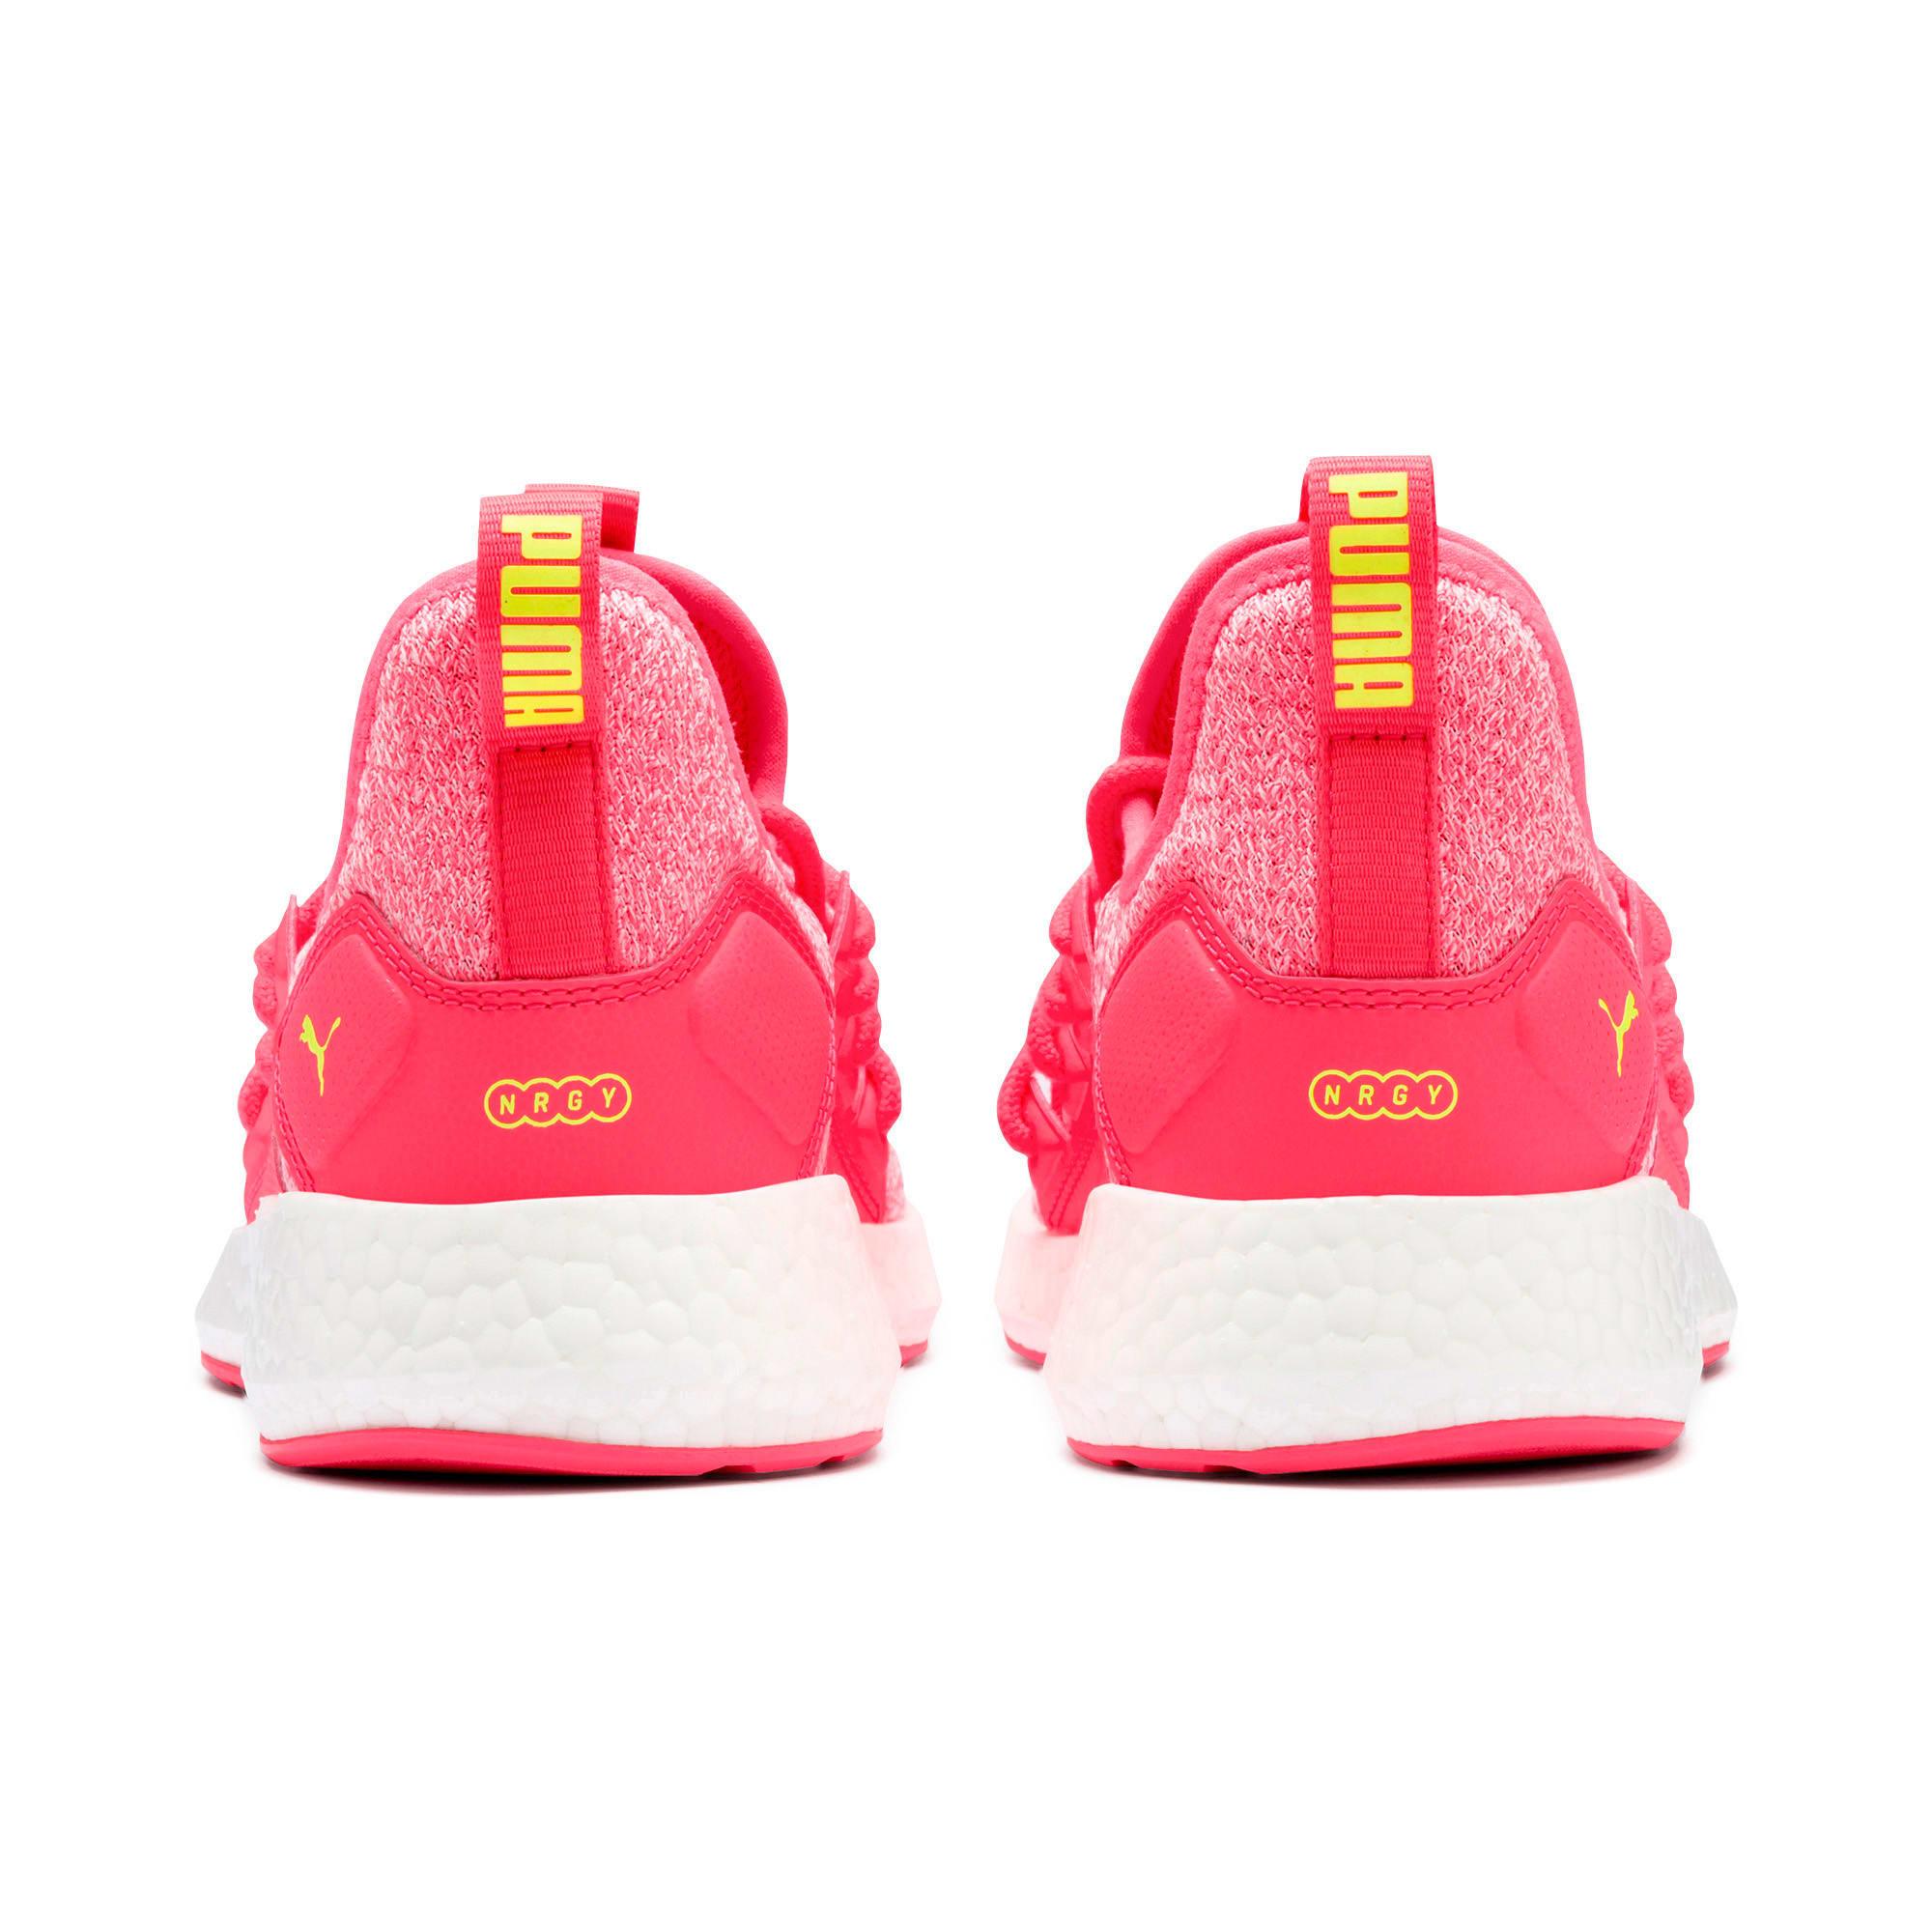 Thumbnail 4 of NRGY Neko Knit Women's Running Shoes, Pink Alert-Puma White, medium